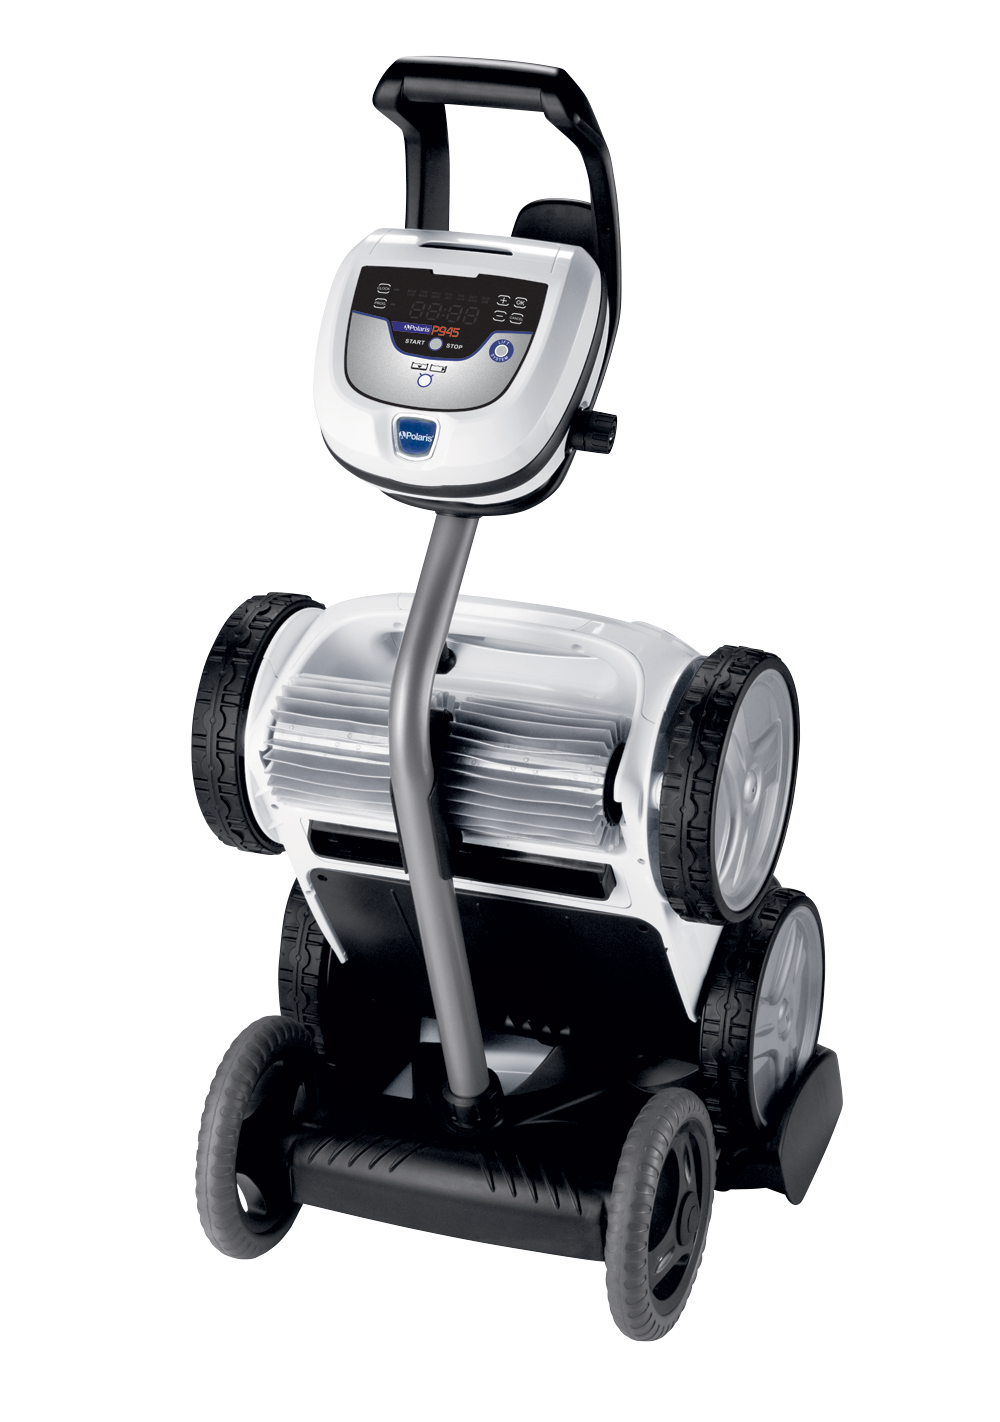 Polaris P945 Robotic Pool Cleaner 1 Swimming Pool Cleaner Worldwide Polaris Automatic Pool